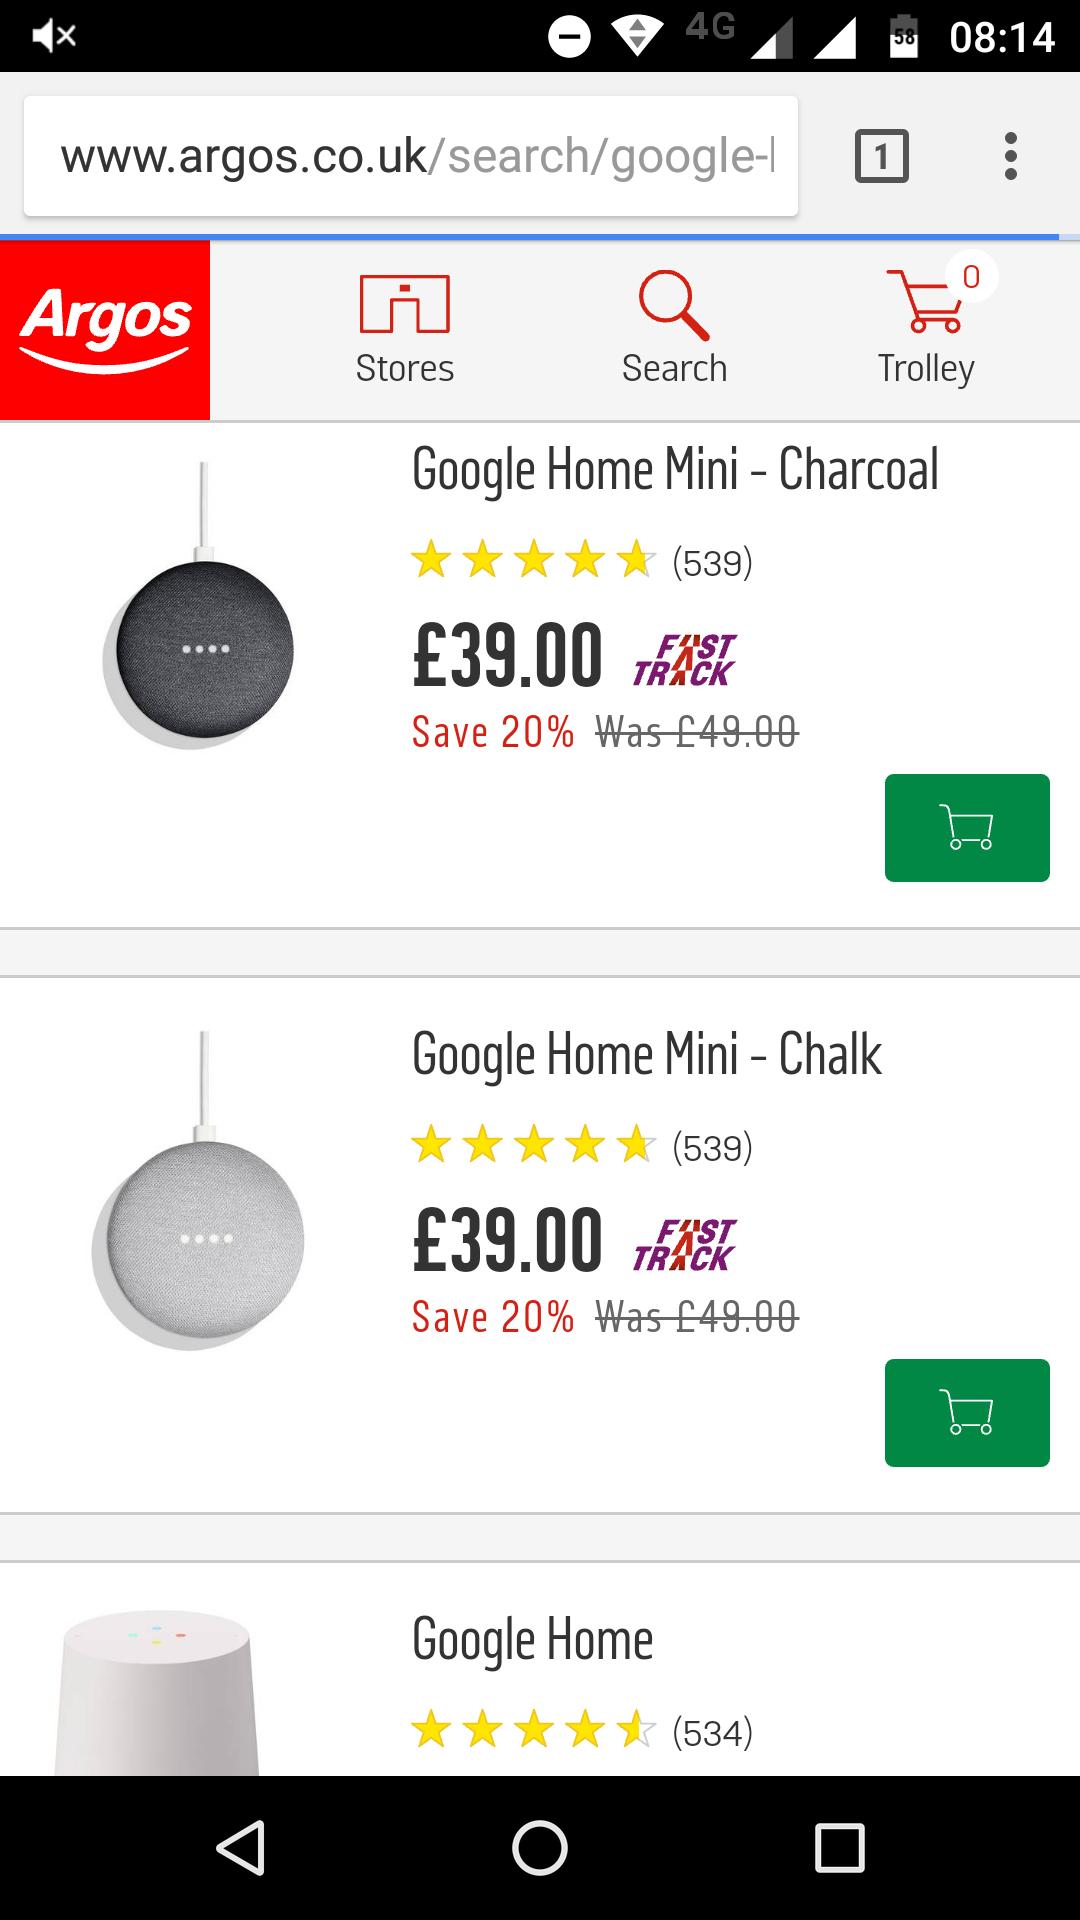 Google Home Mini £39 @ Argos